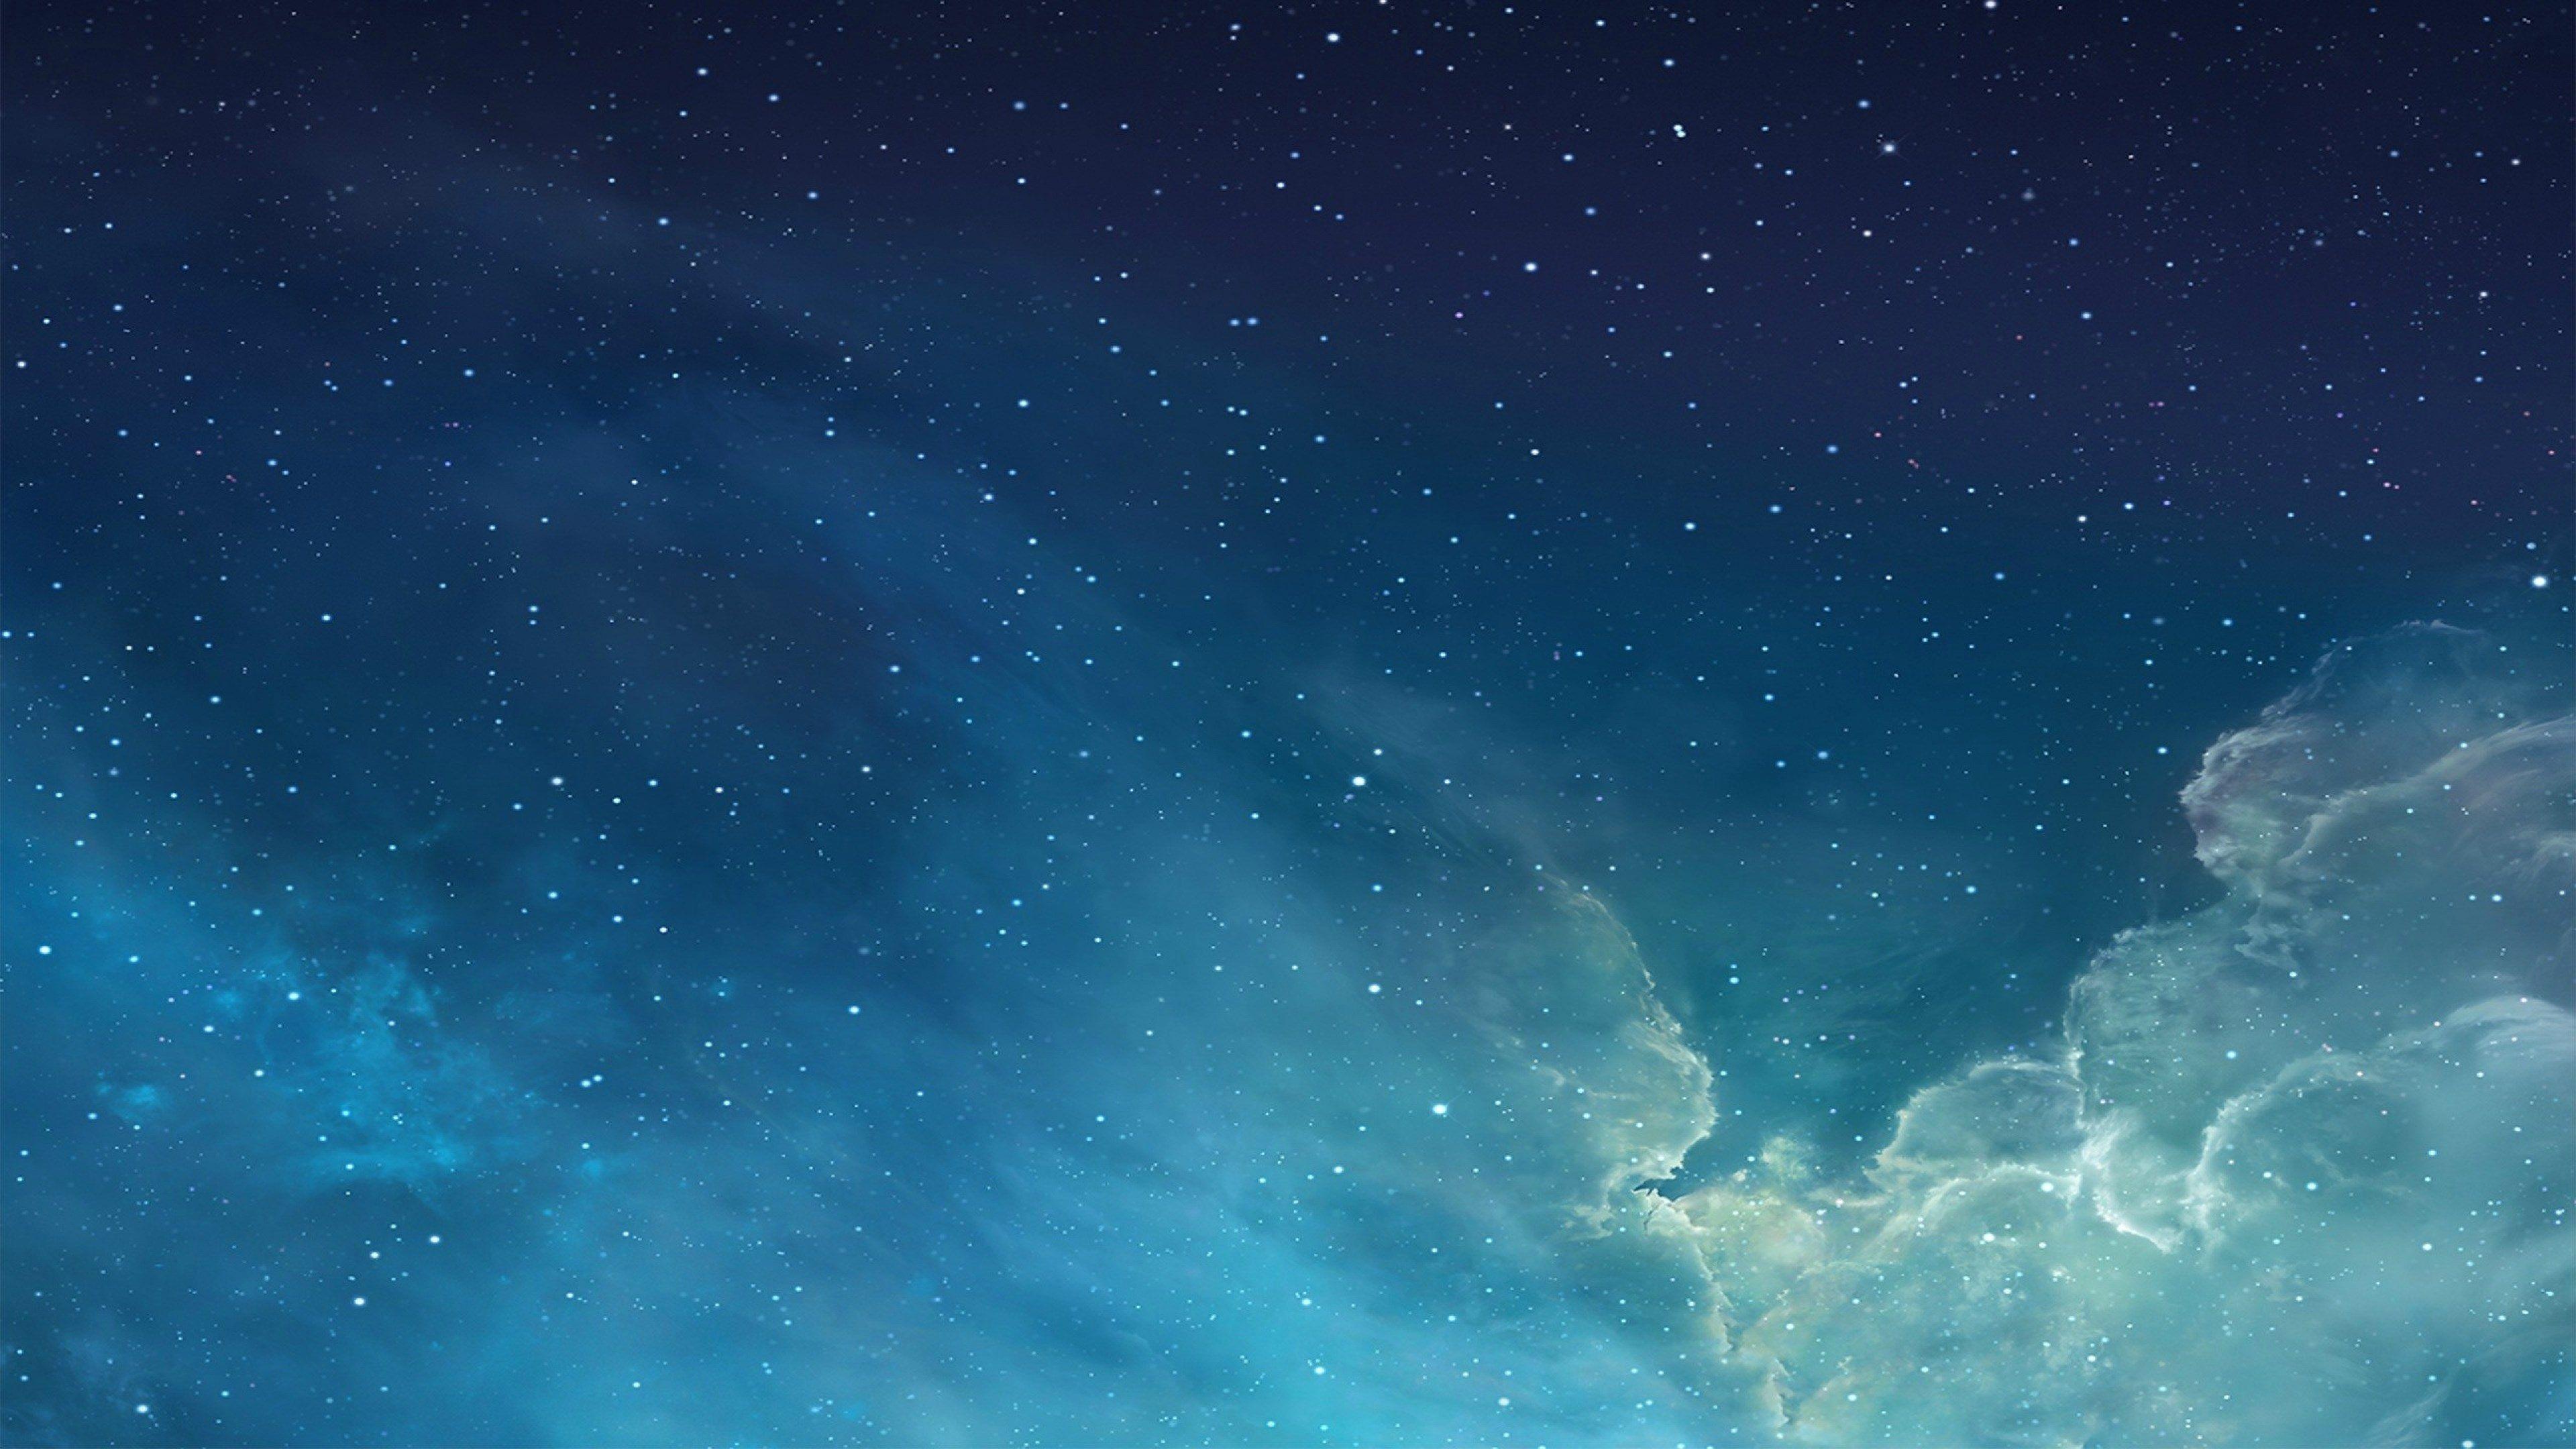 3840x2160 apple 4k ultra hd desktop wallpaper wallpapers and 3840x2160